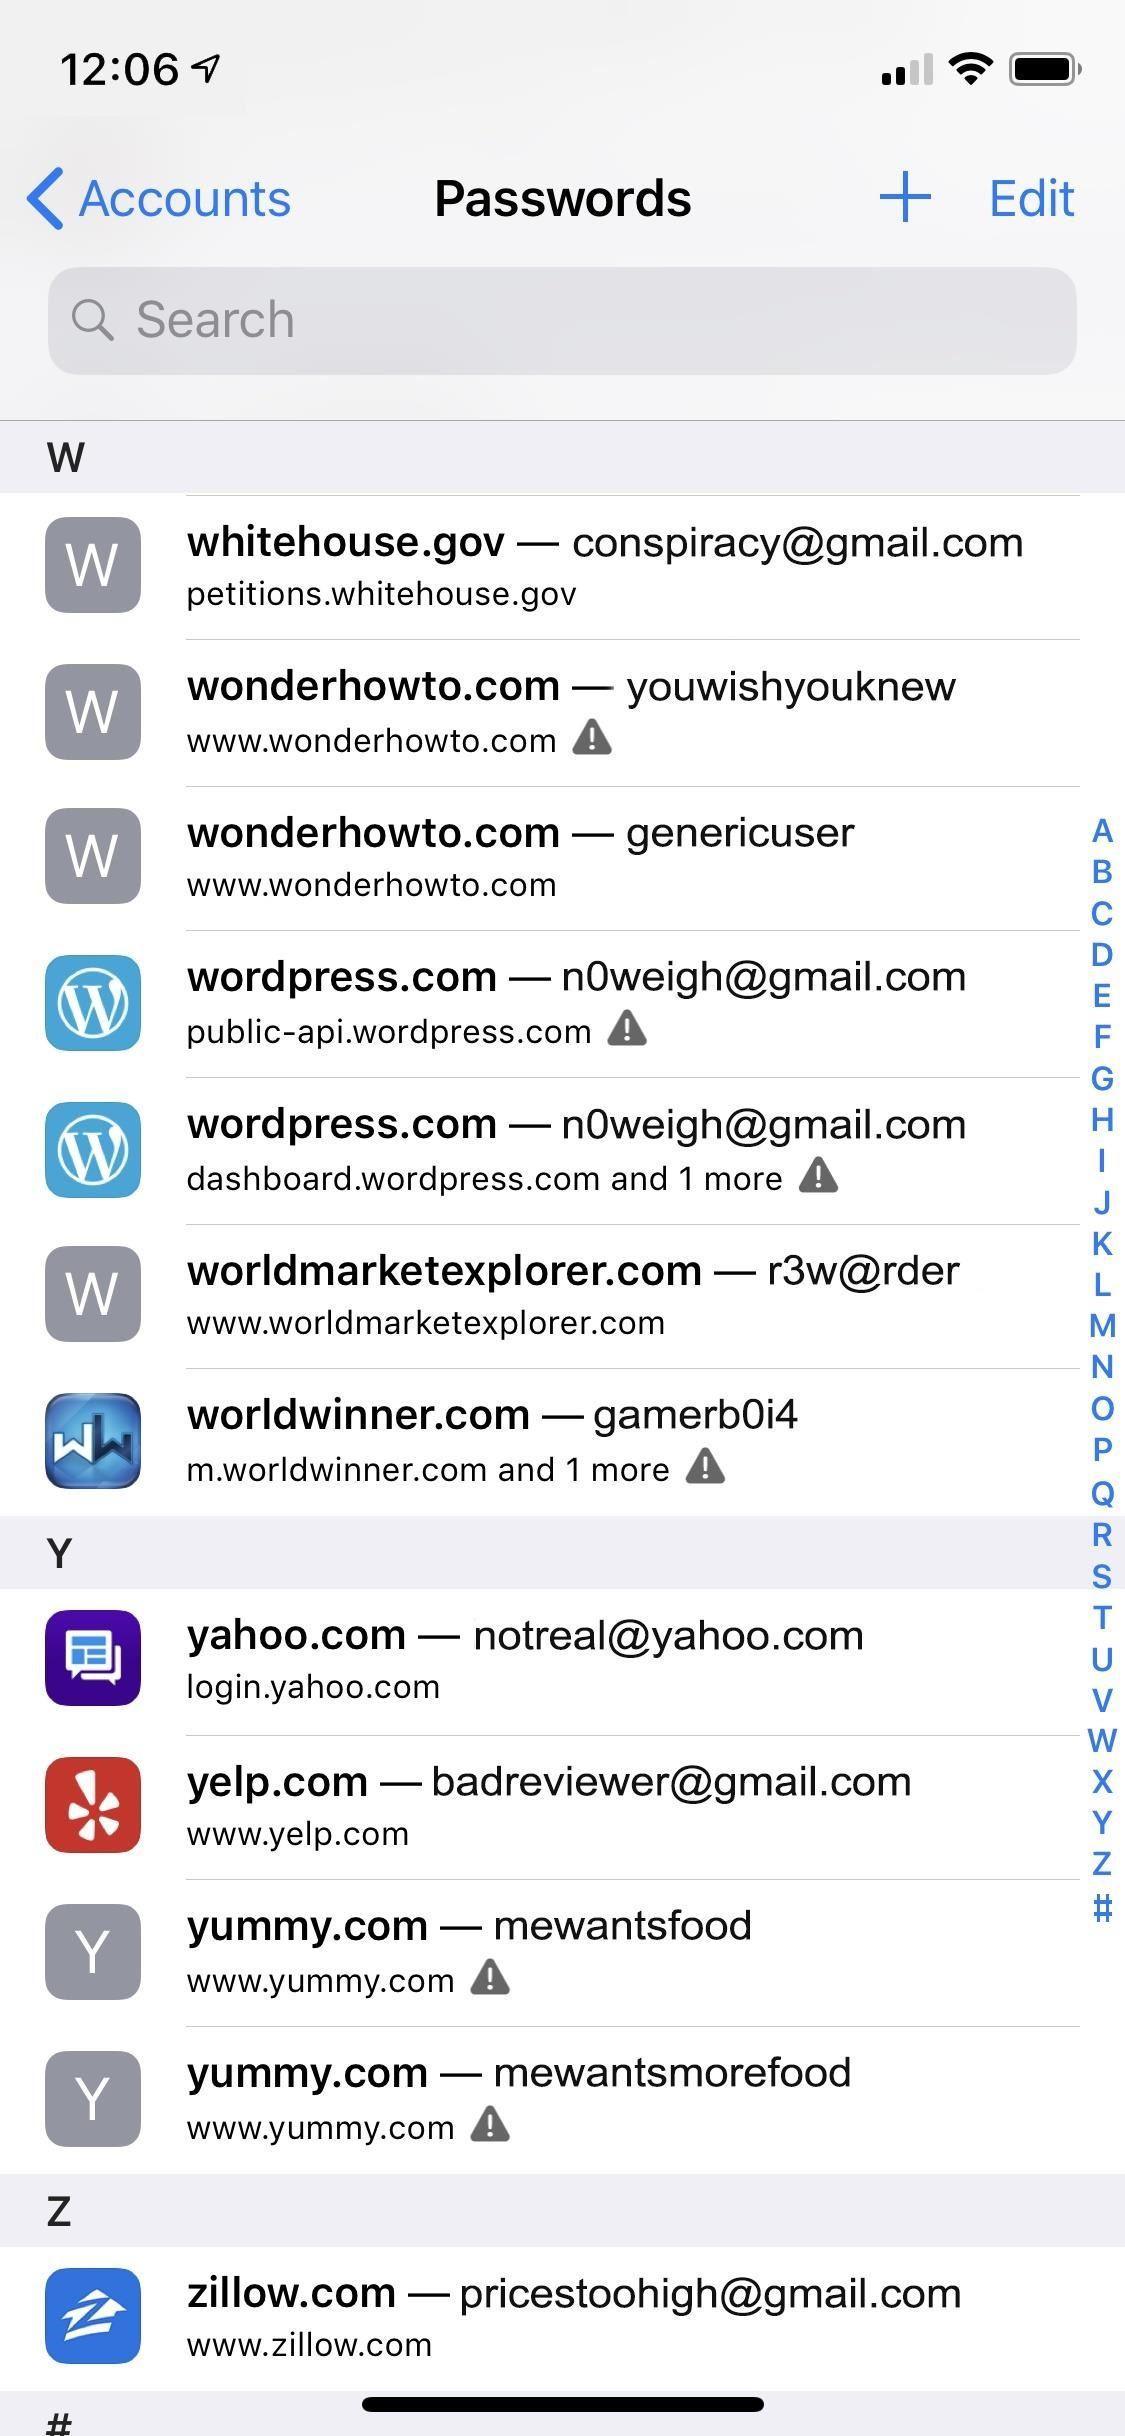 How to make weak reused passwords easier to use in iOS12